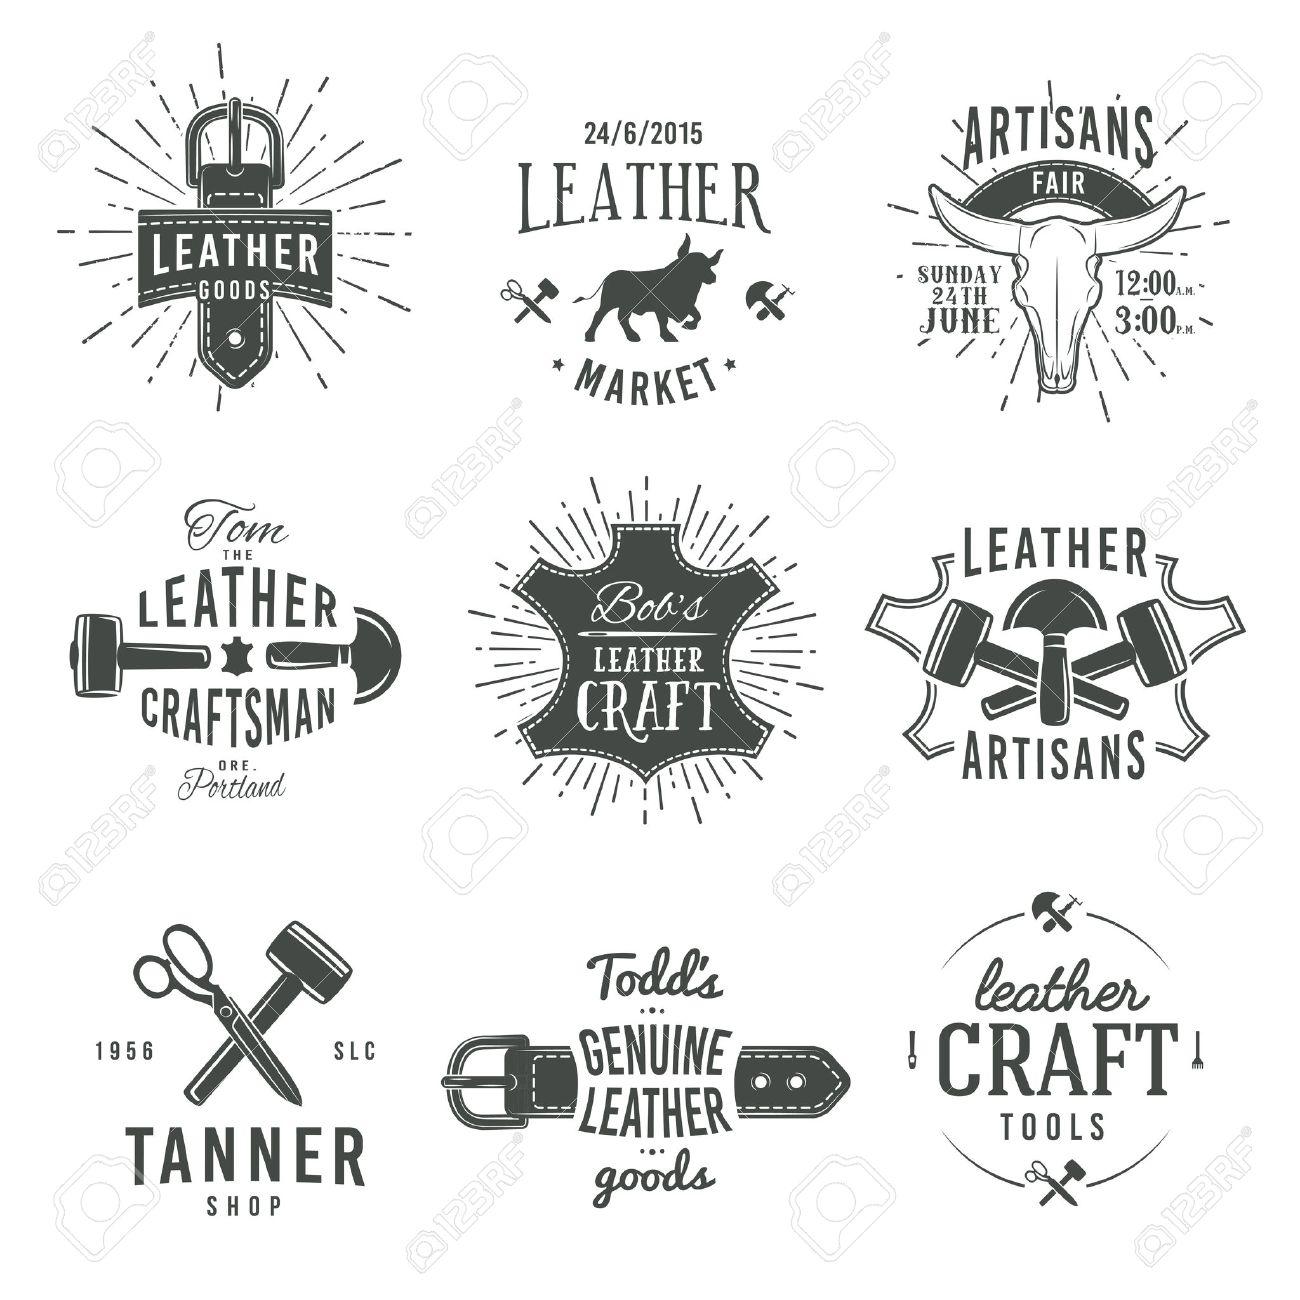 Second set of grey vector vintage craftsman logo designs, retro genuine leather tool labels. artisan craft market insignia illustration. - 41058038